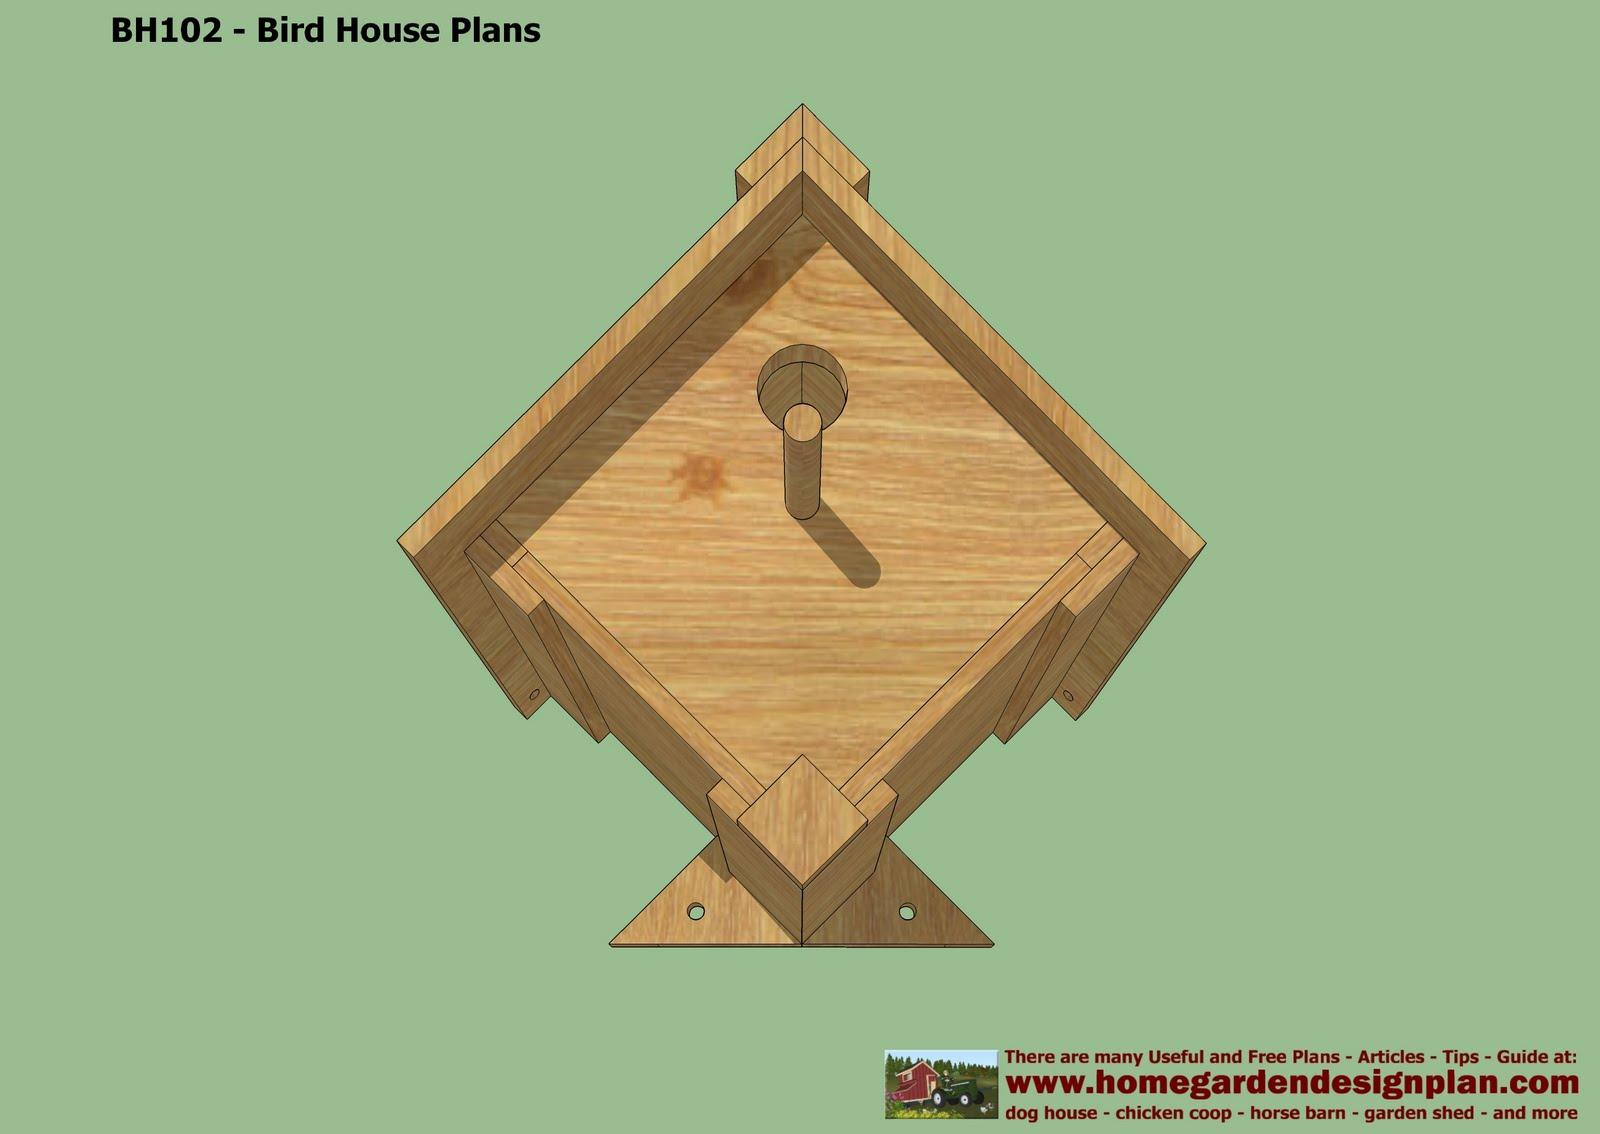 Dream wood design pigeon bird house plans for Wood design plans